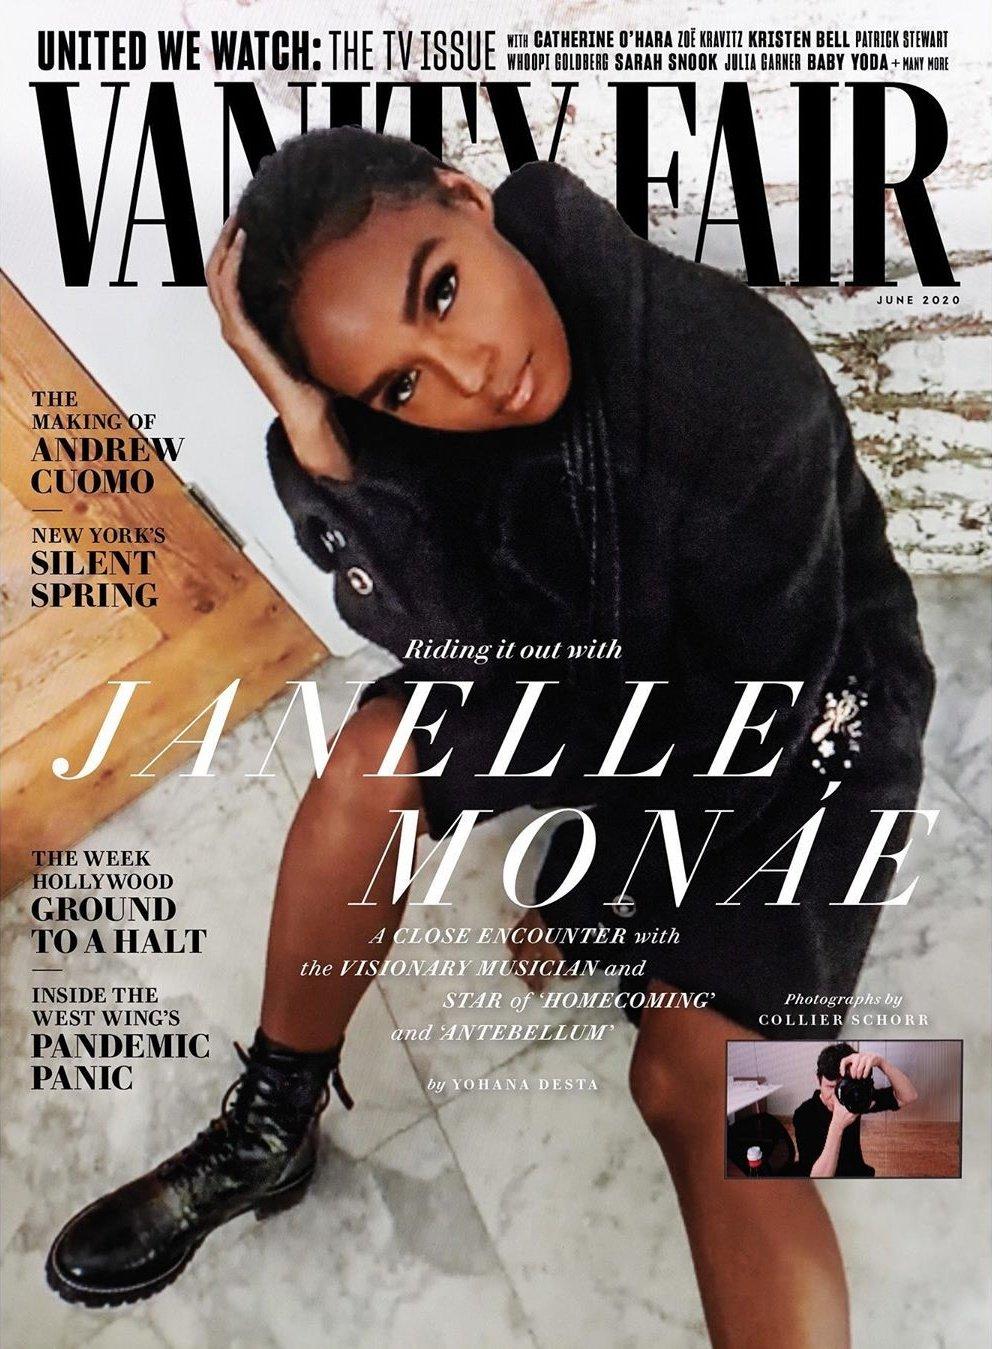 Magazine Covers On Twitter In 2020 Vanity Fair Magazine Catherine O Hara Vanity Fair